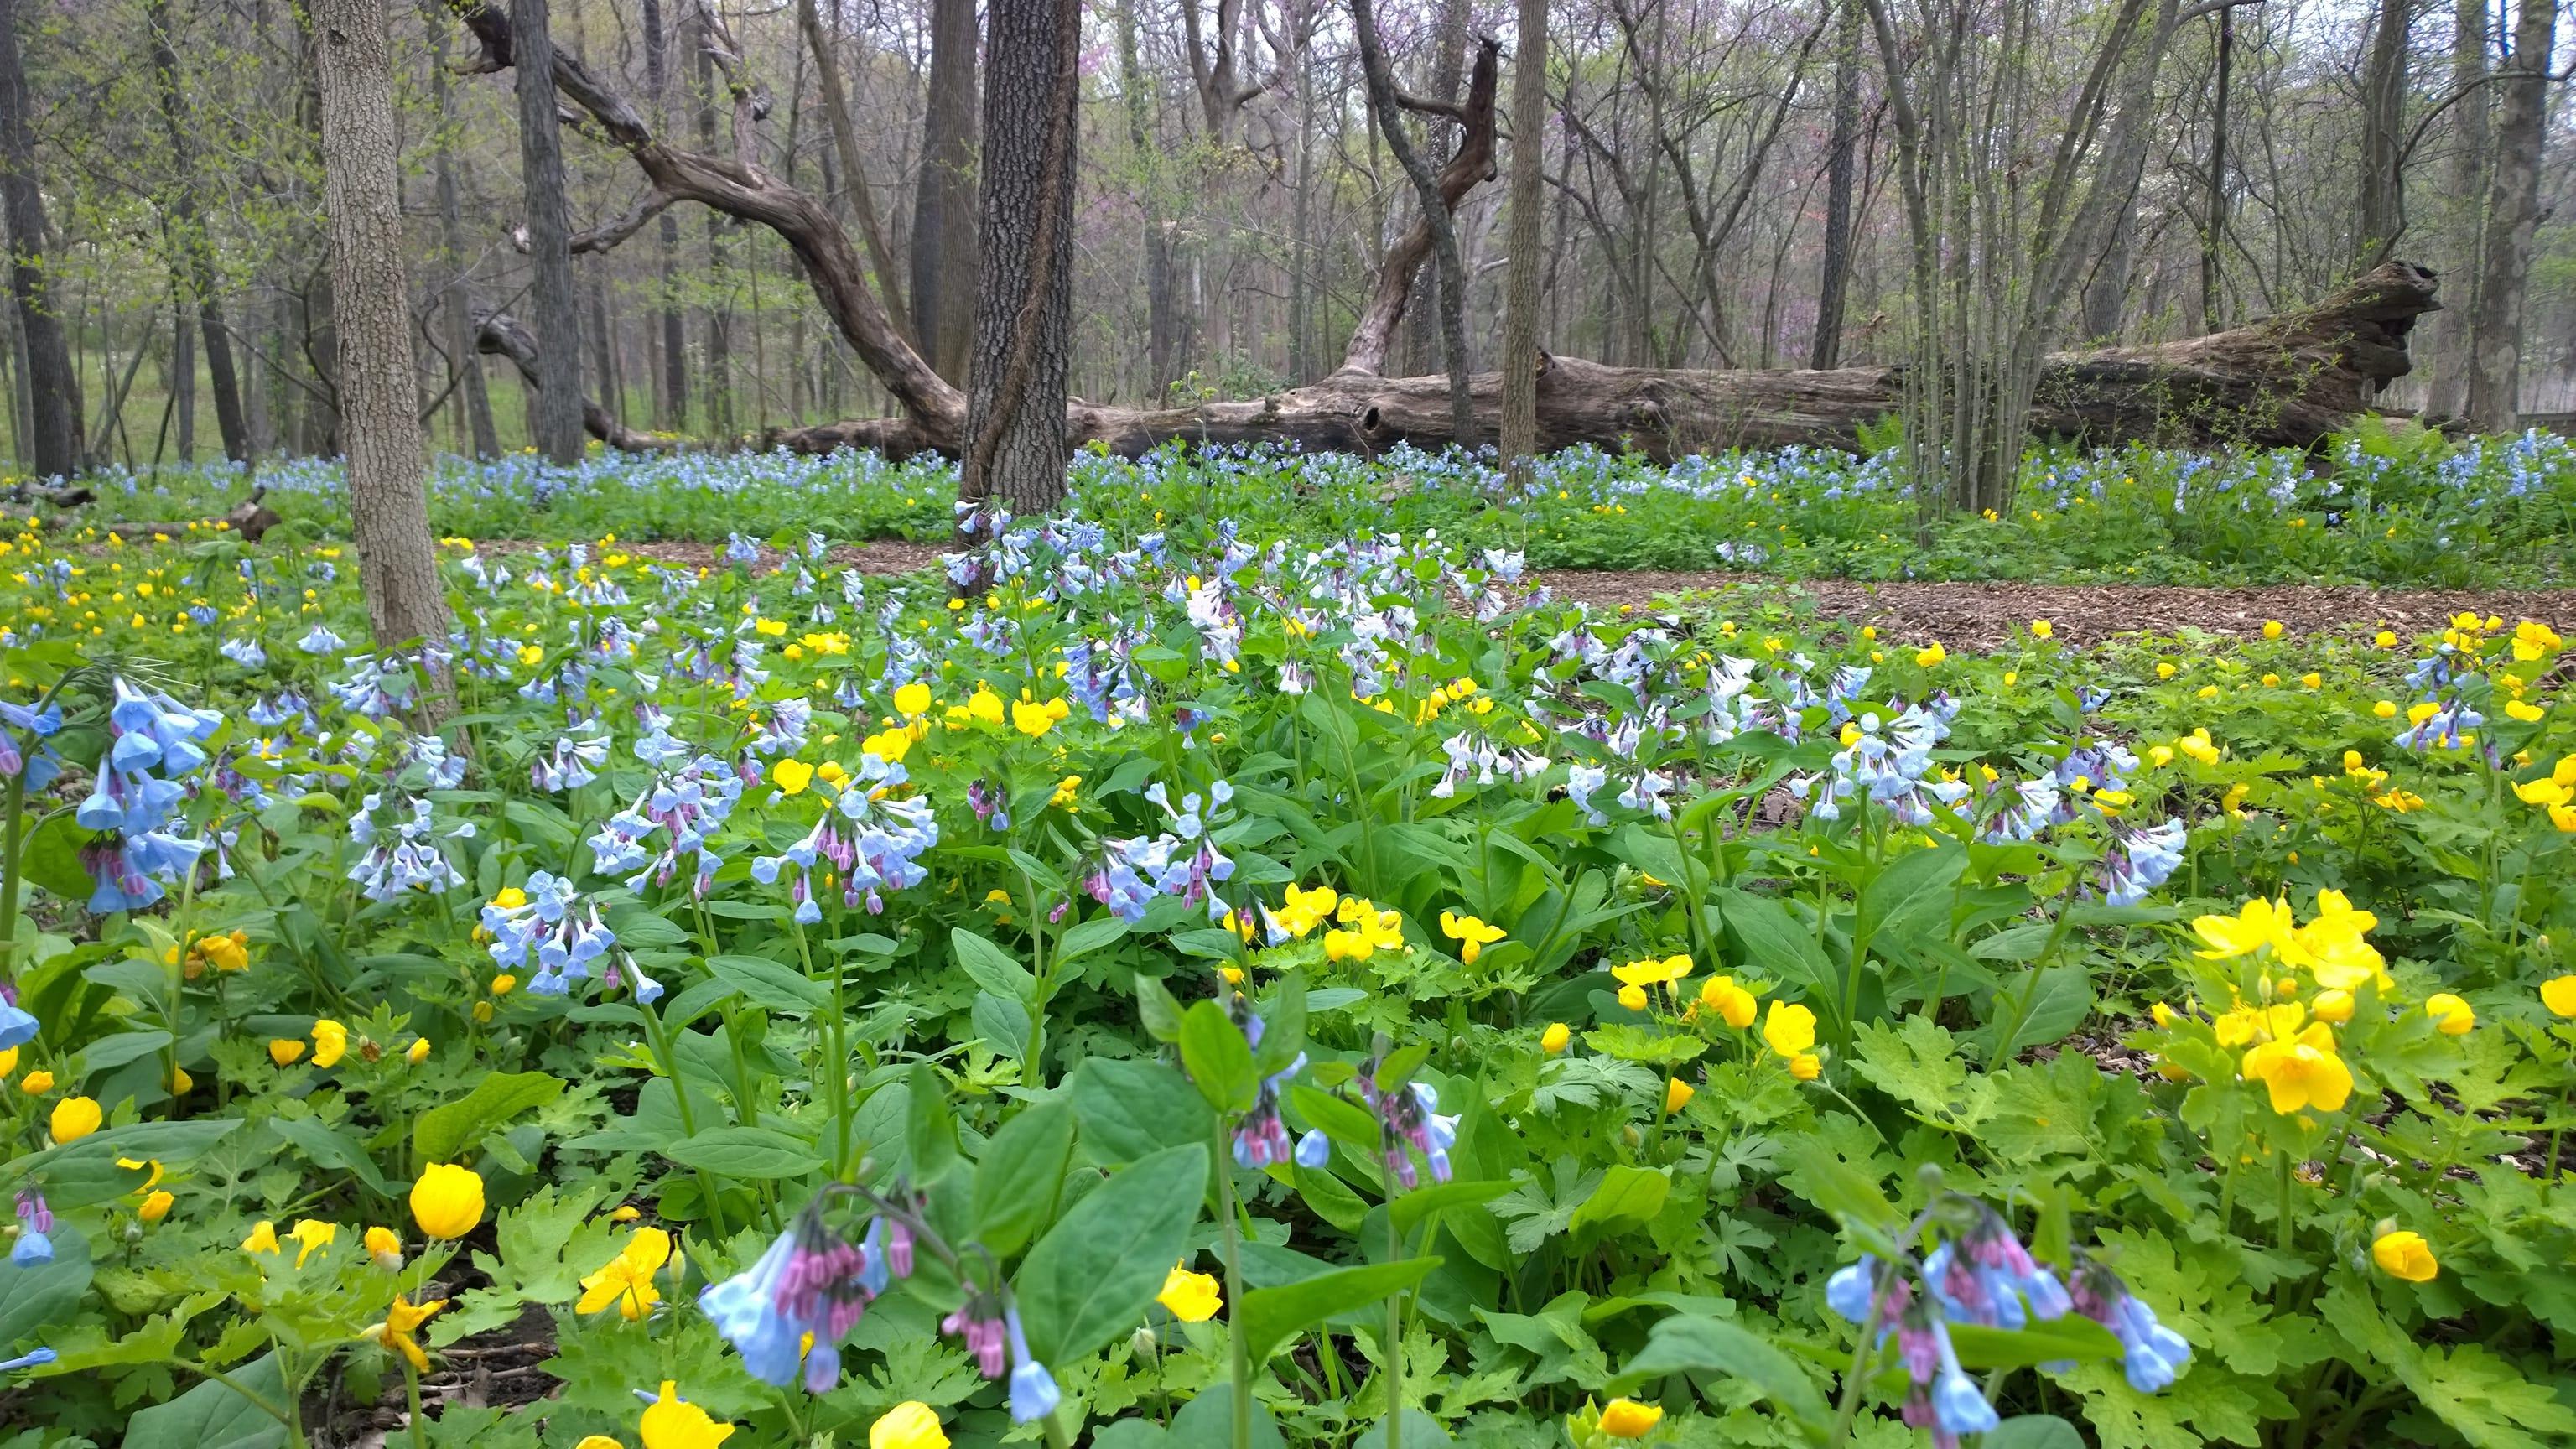 Celandine poppies and bluebells at the Missouri Botanical Garden. Credit: Scott Woodbury